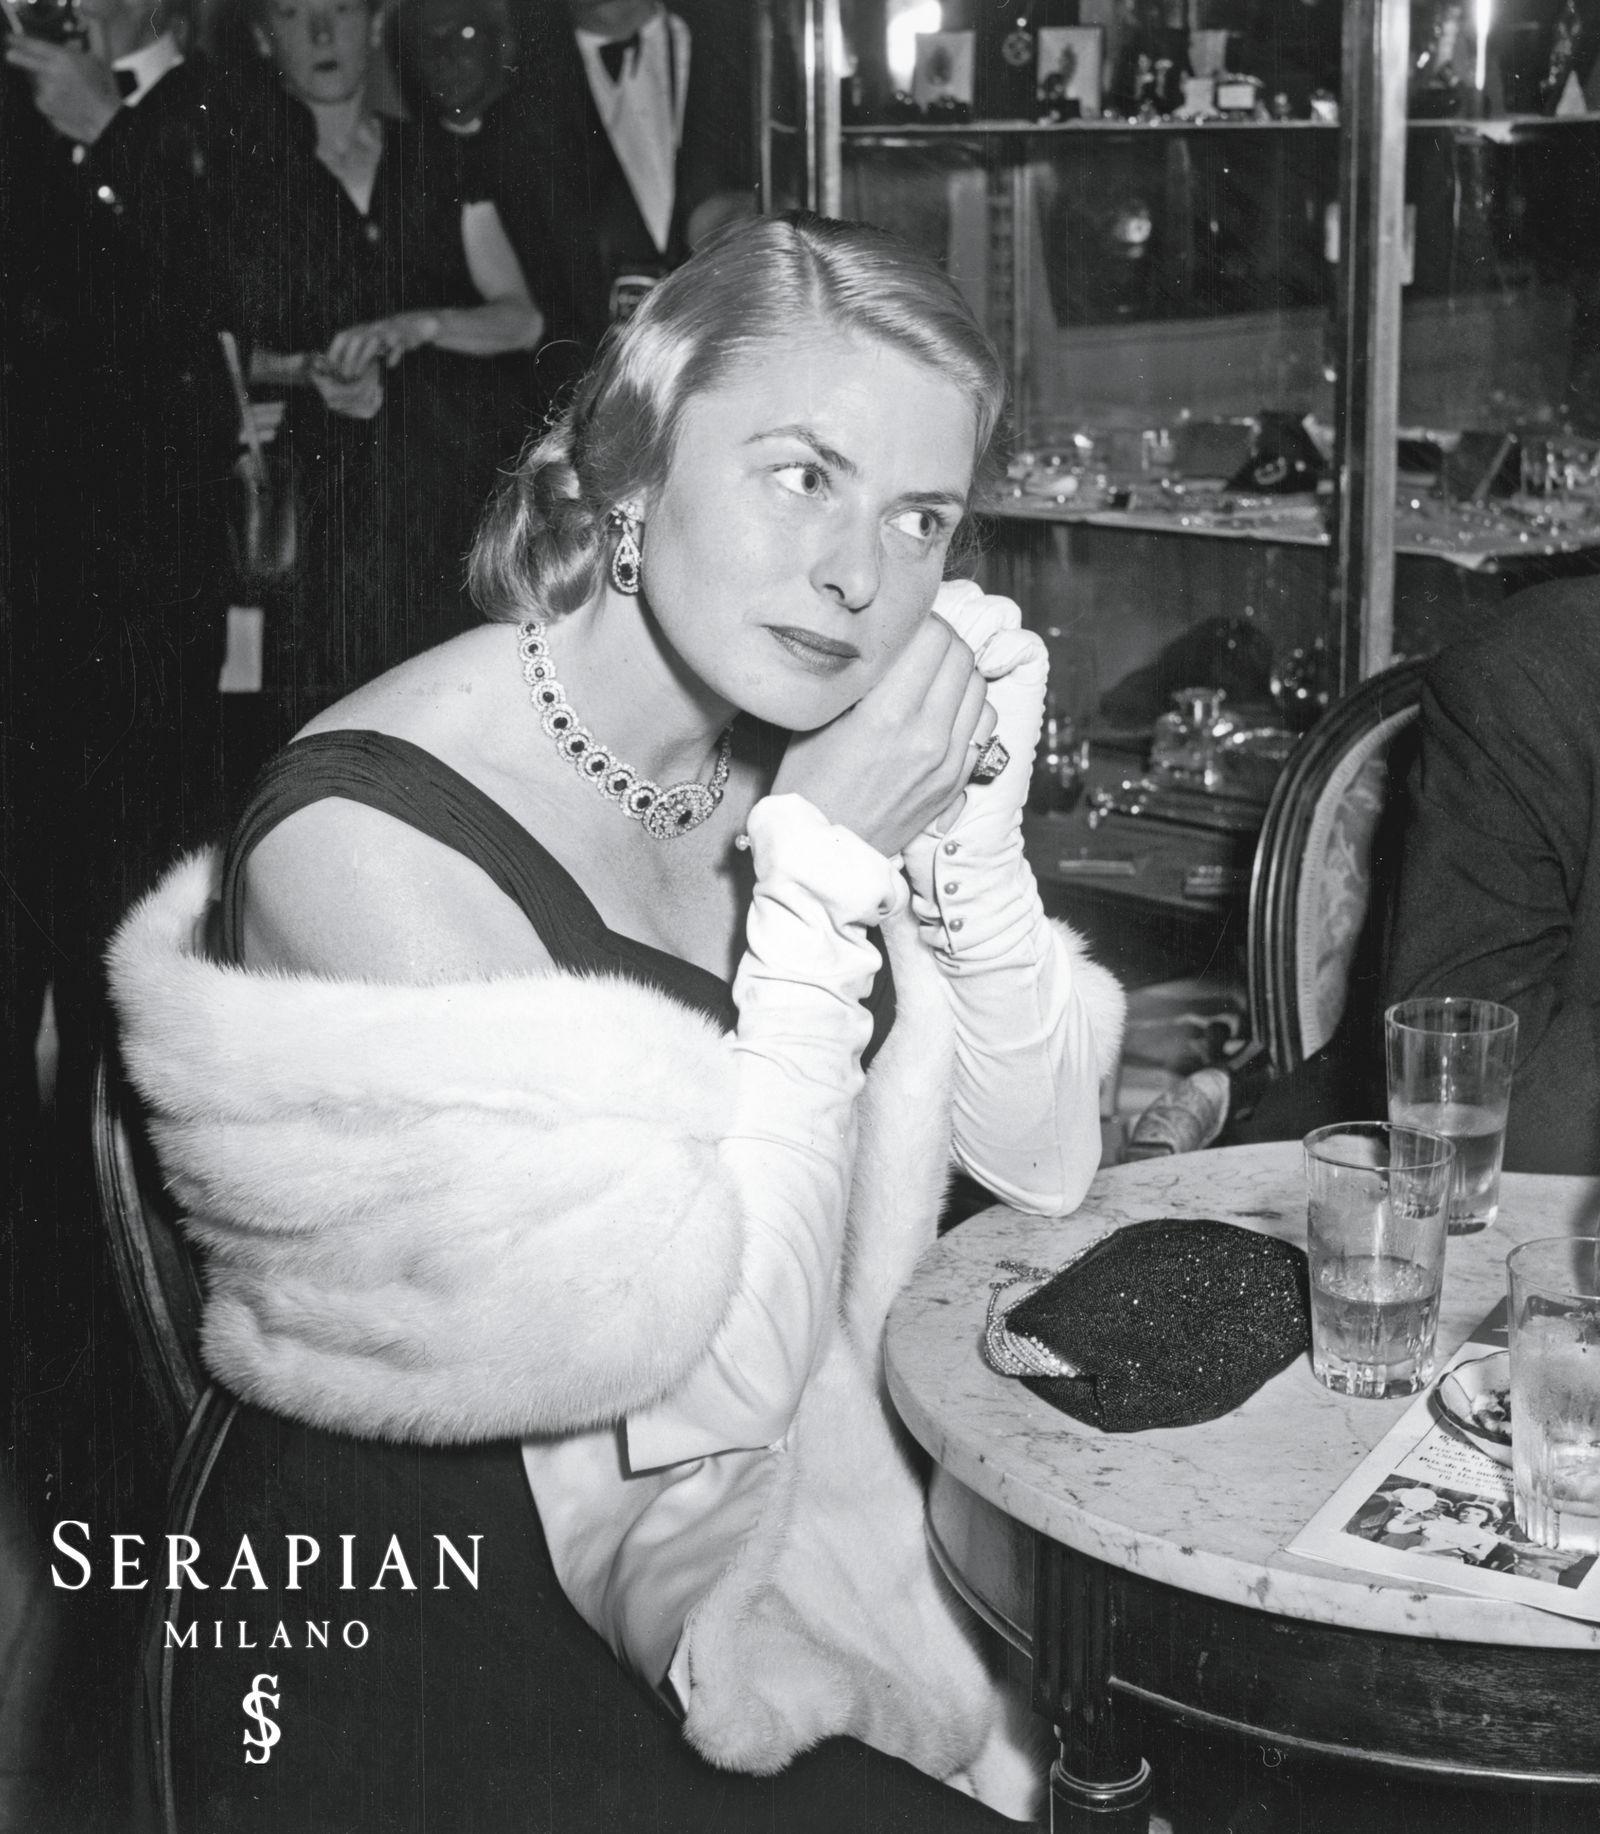 SERAPIAN (Image 2)